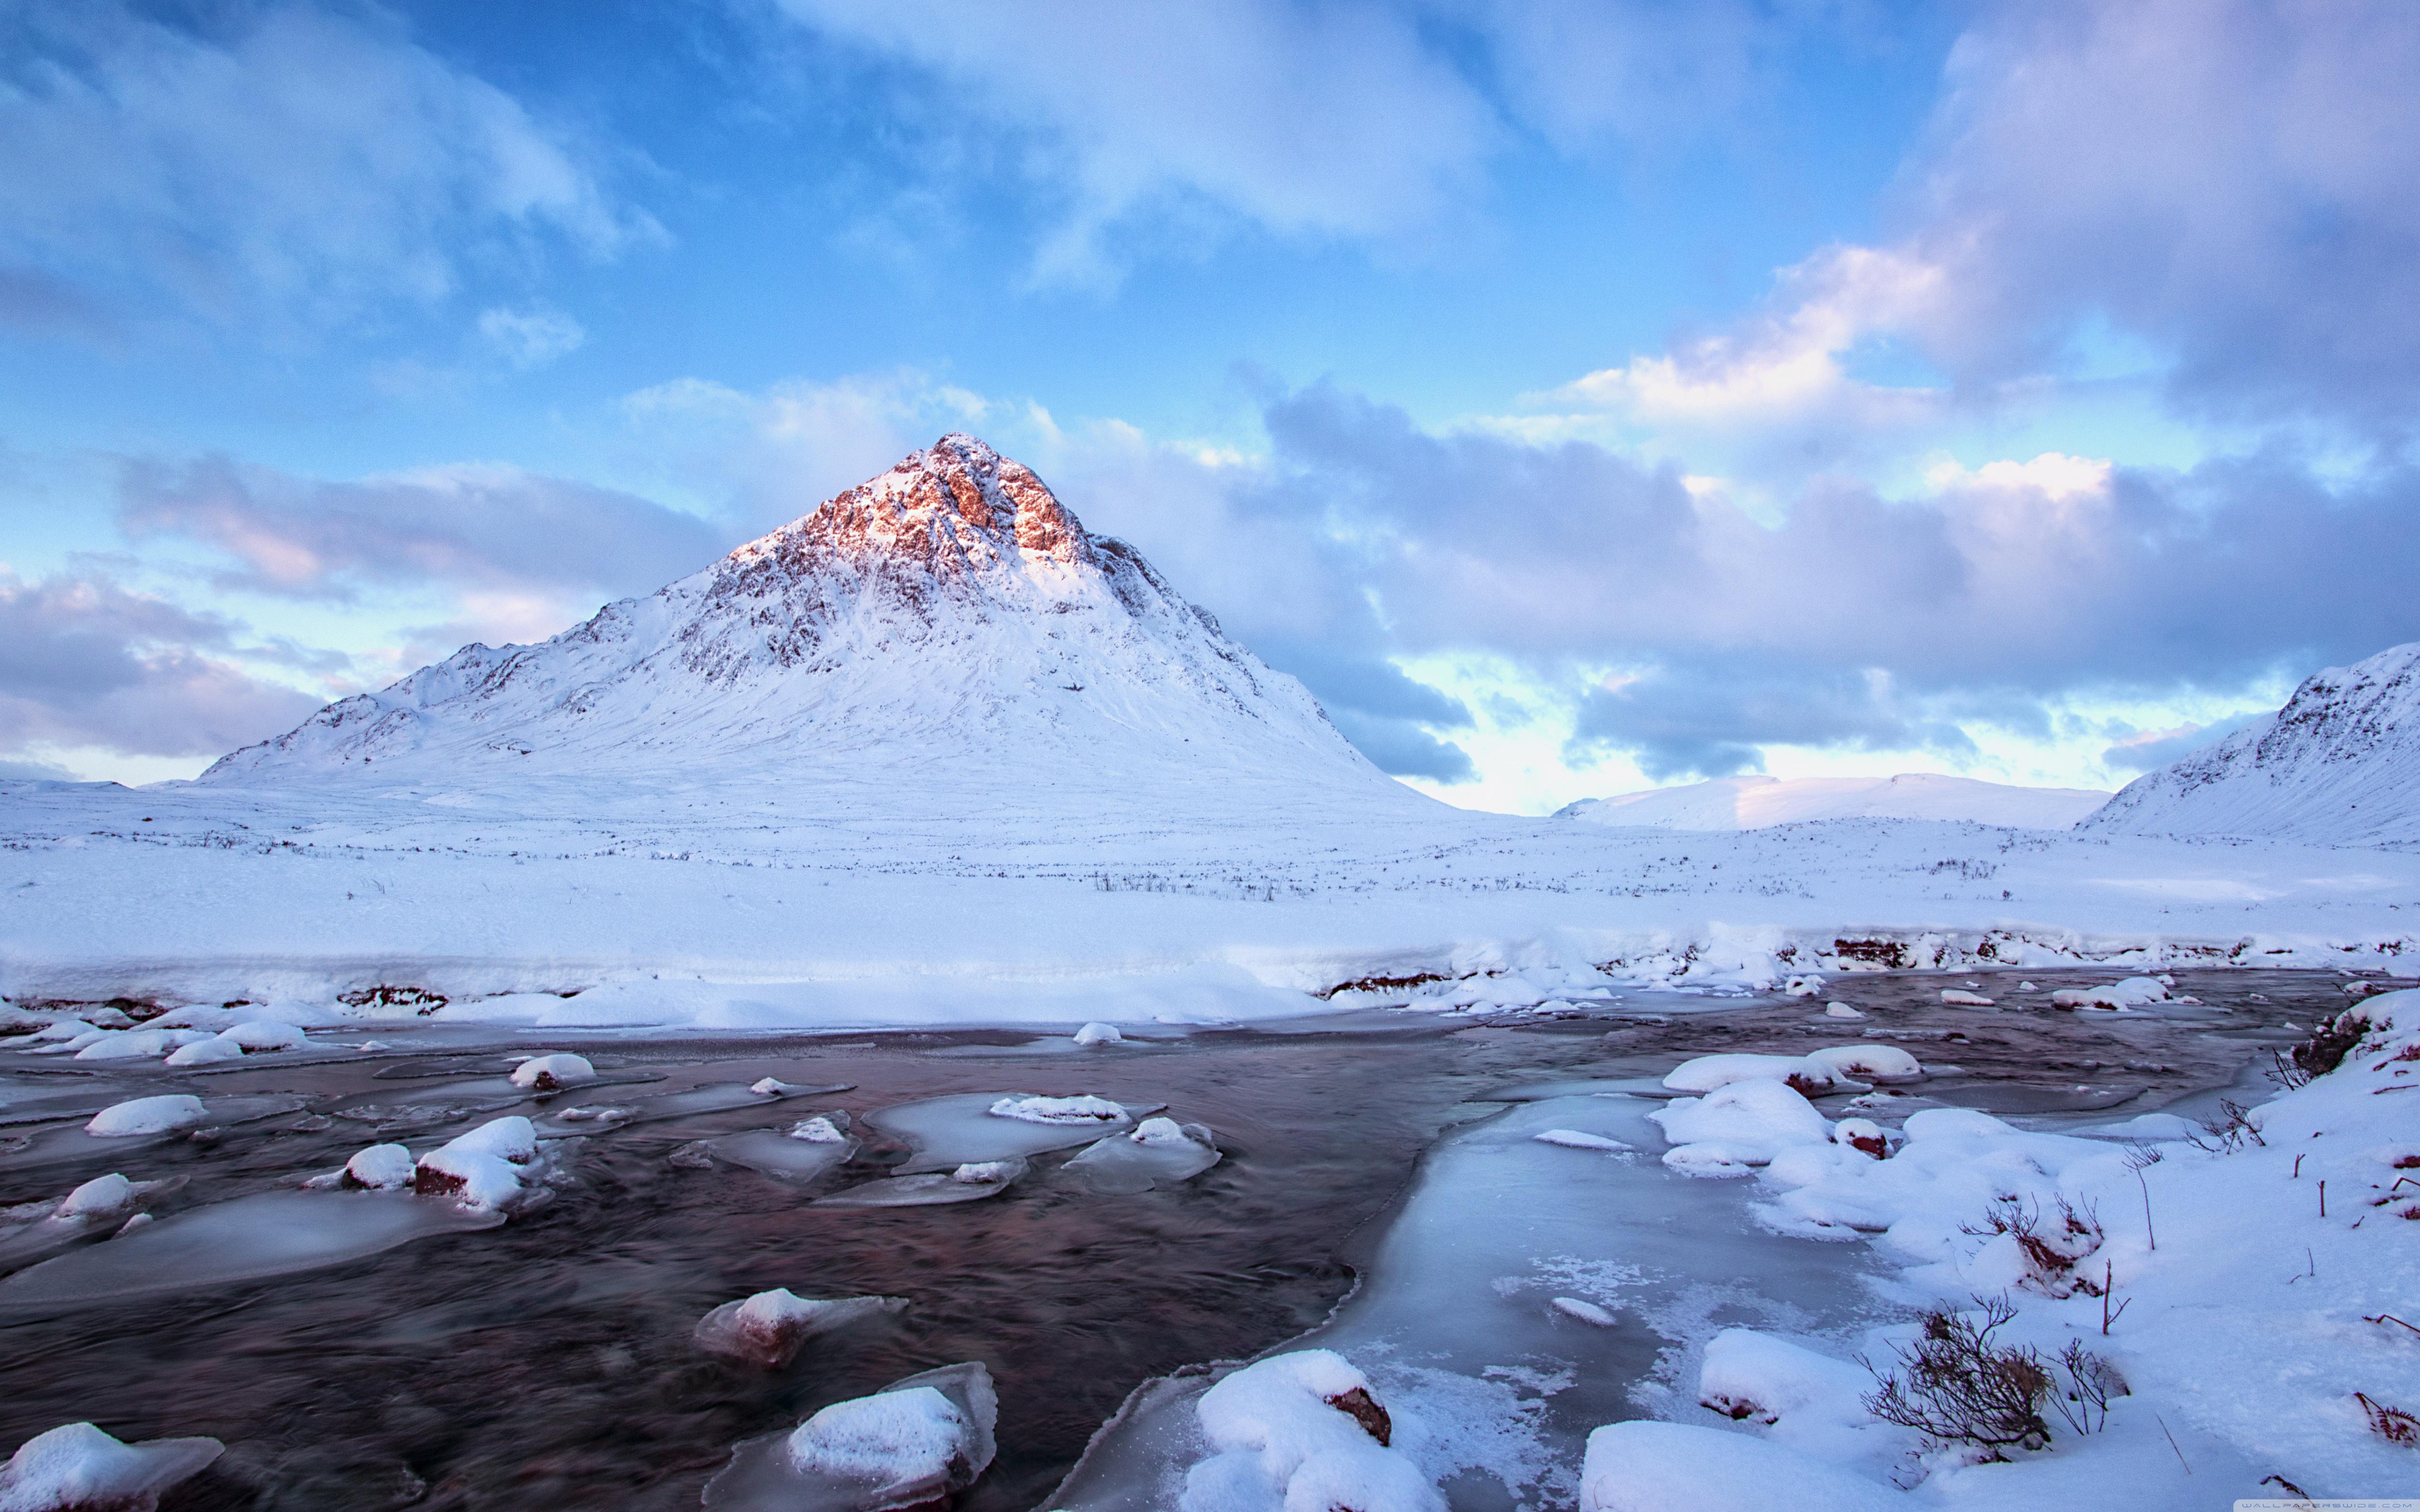 Snow Mountains Winter Scenery 4k - Snow Mountain Wallpaper 4k , HD Wallpaper & Backgrounds